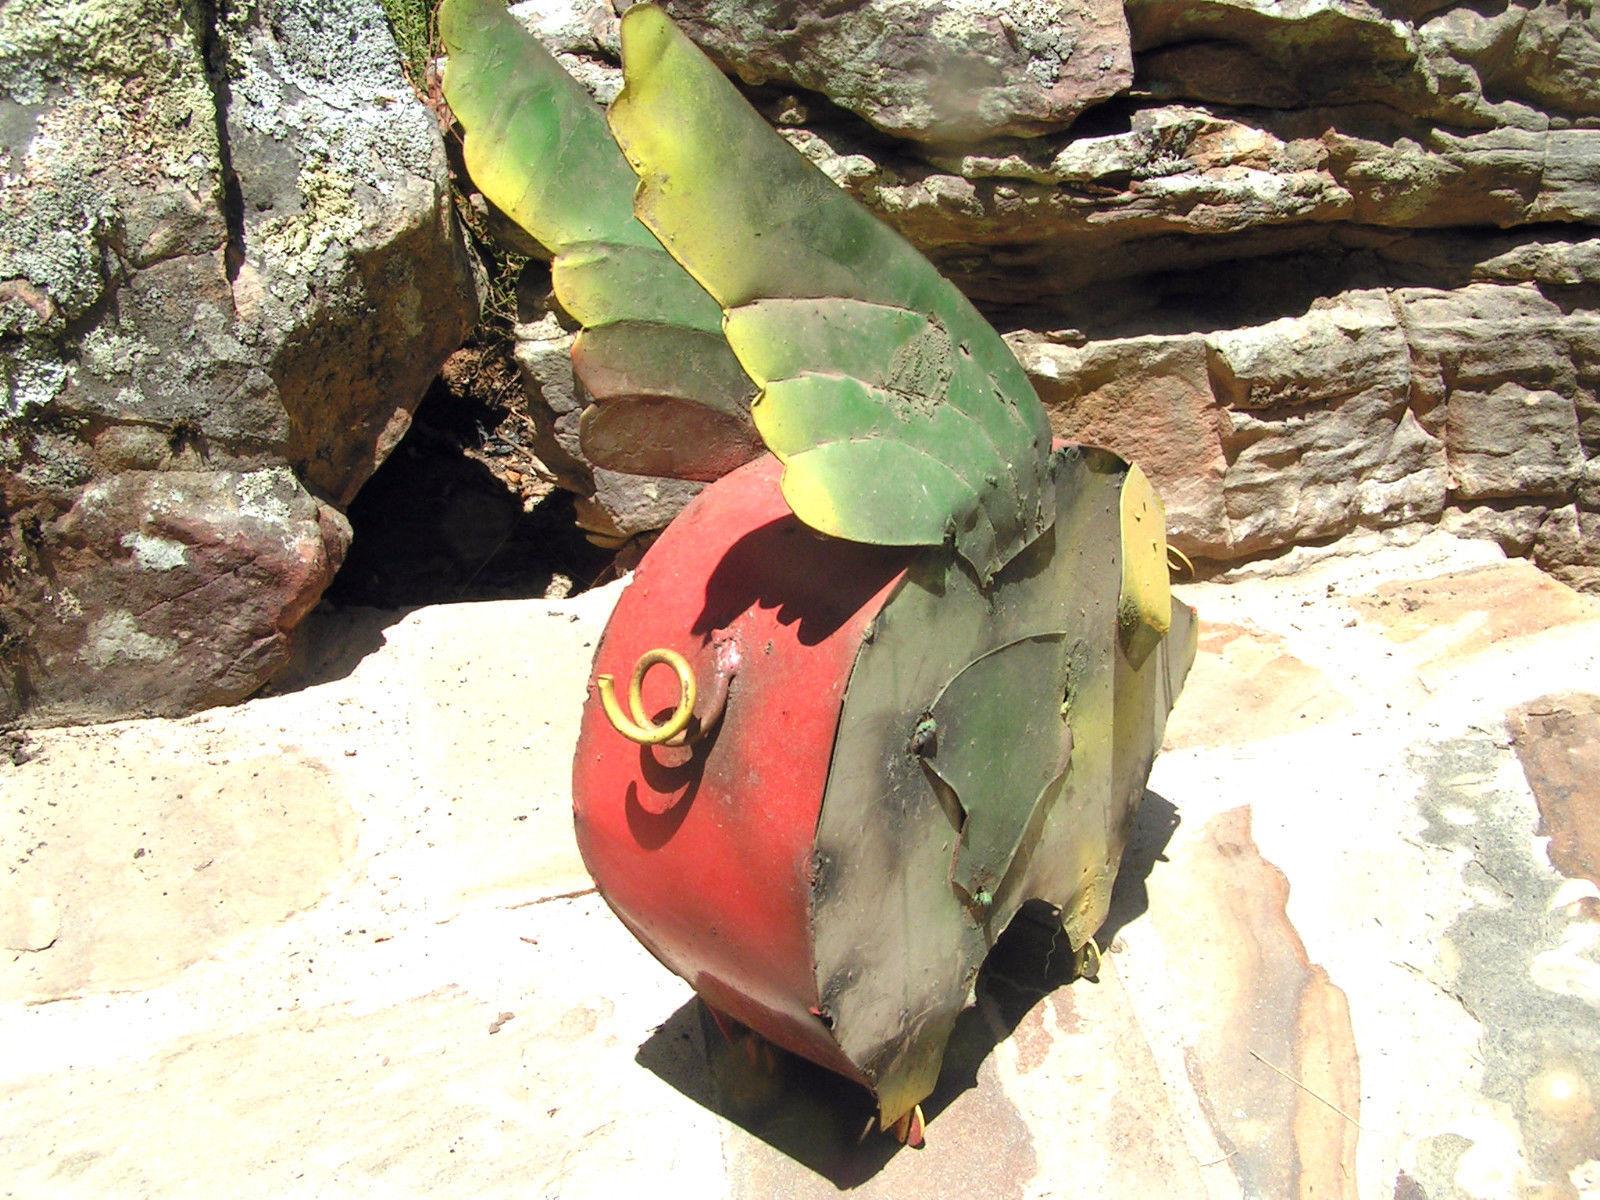 Metal Yard Art Flying Pig Recycled Junk Iron Garden 390 Bz